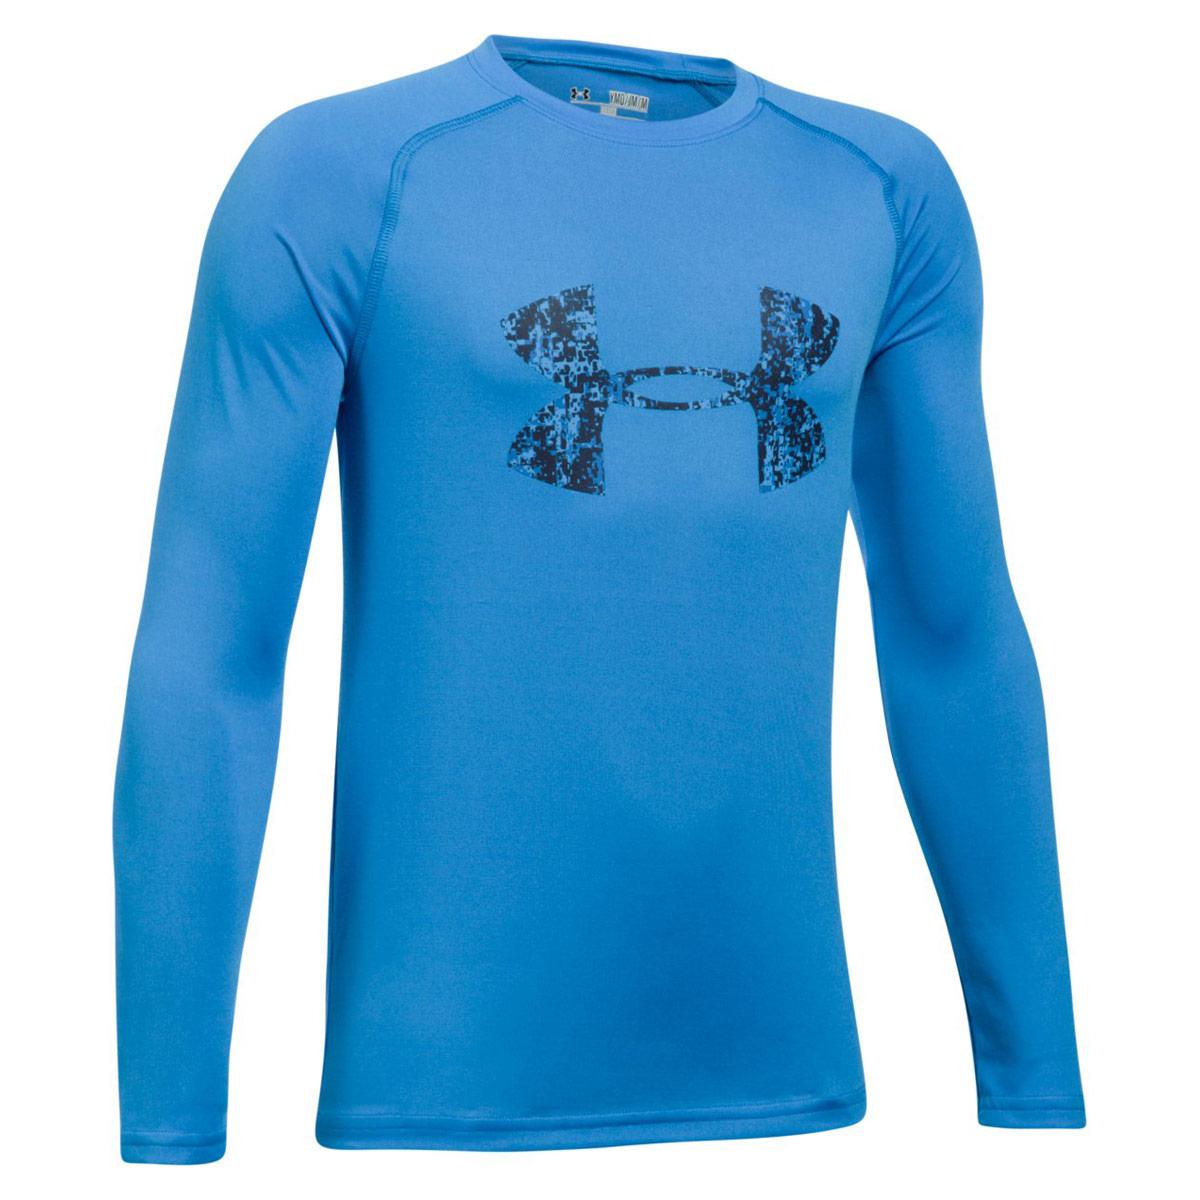 91f2d136 Under Armour Big Logo Long Sleeve Tee - Fitness tops - Blue